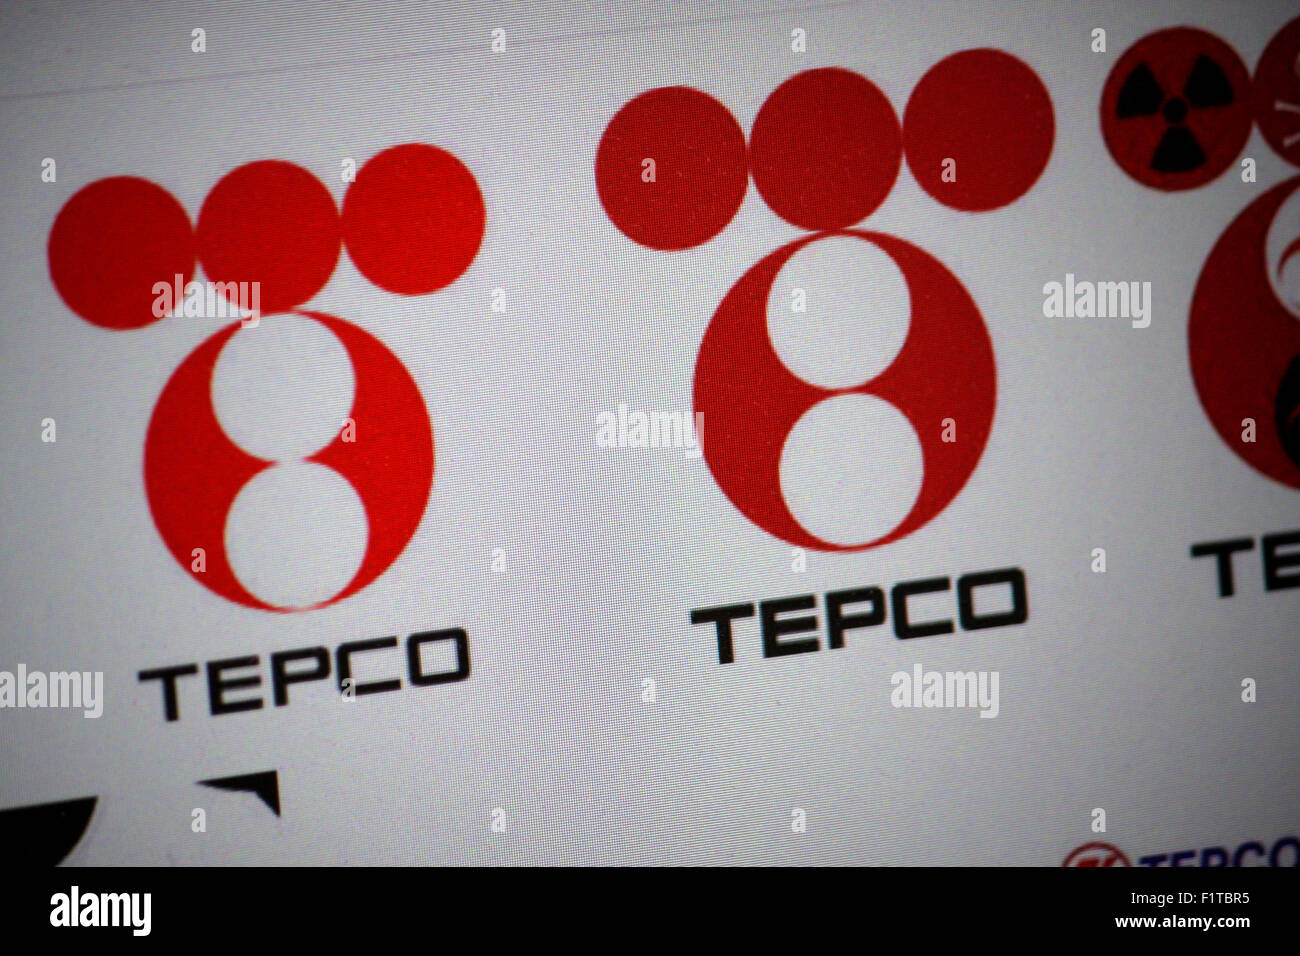 "Markenname: ""TEPCO - Tokyo Electric Power Company"", Dezember 2013, Berlin. Stockbild"